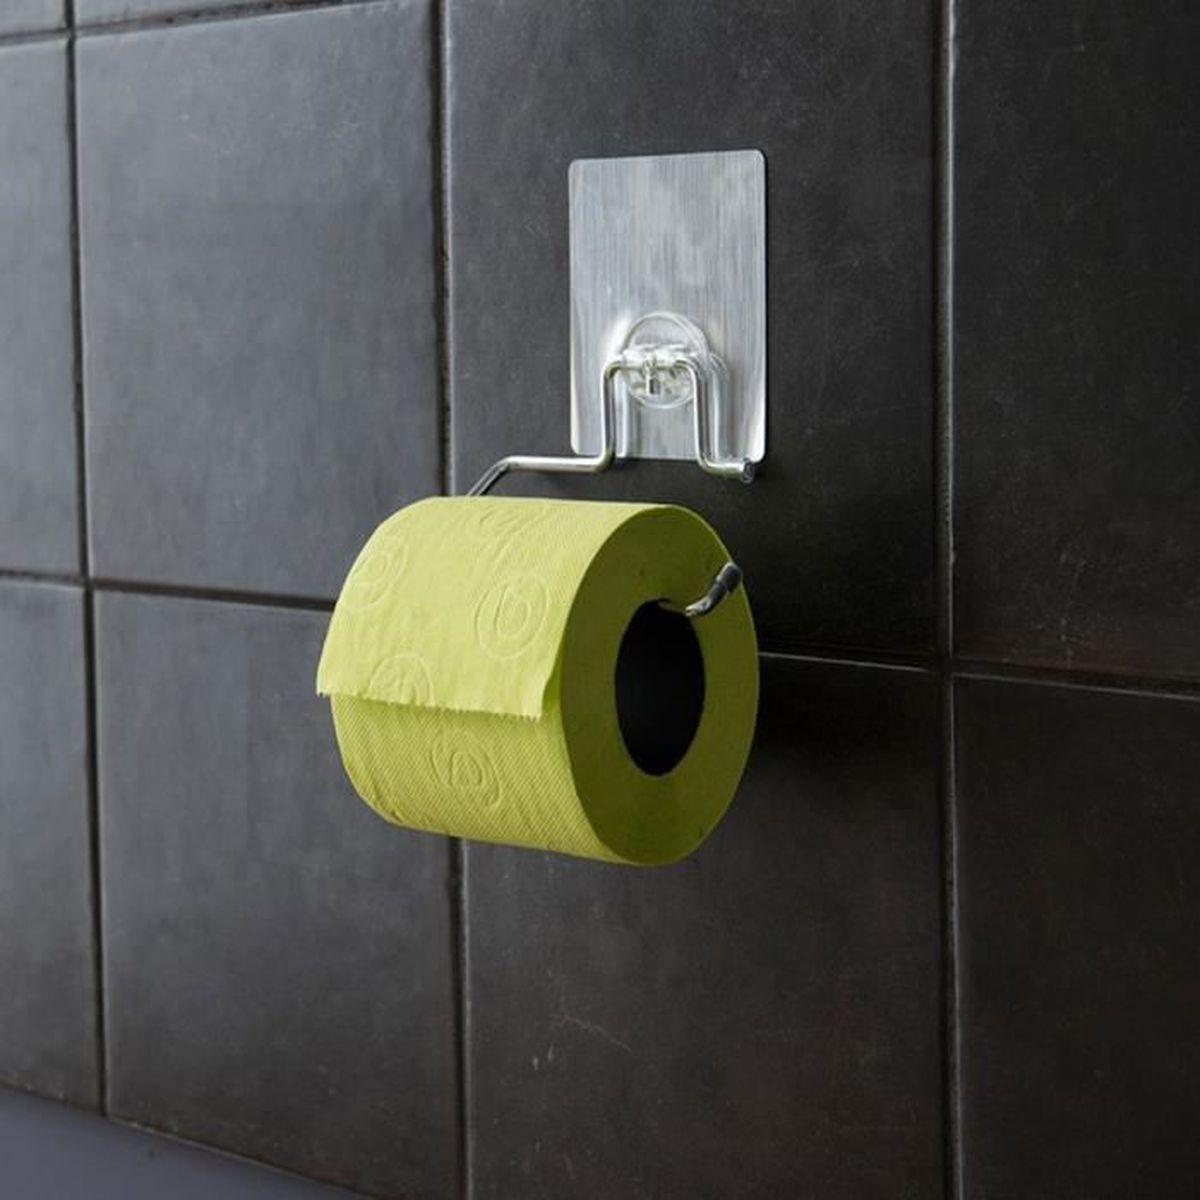 Porte papier toilette bestlock magic bath achat vente for Decoration porte toilette